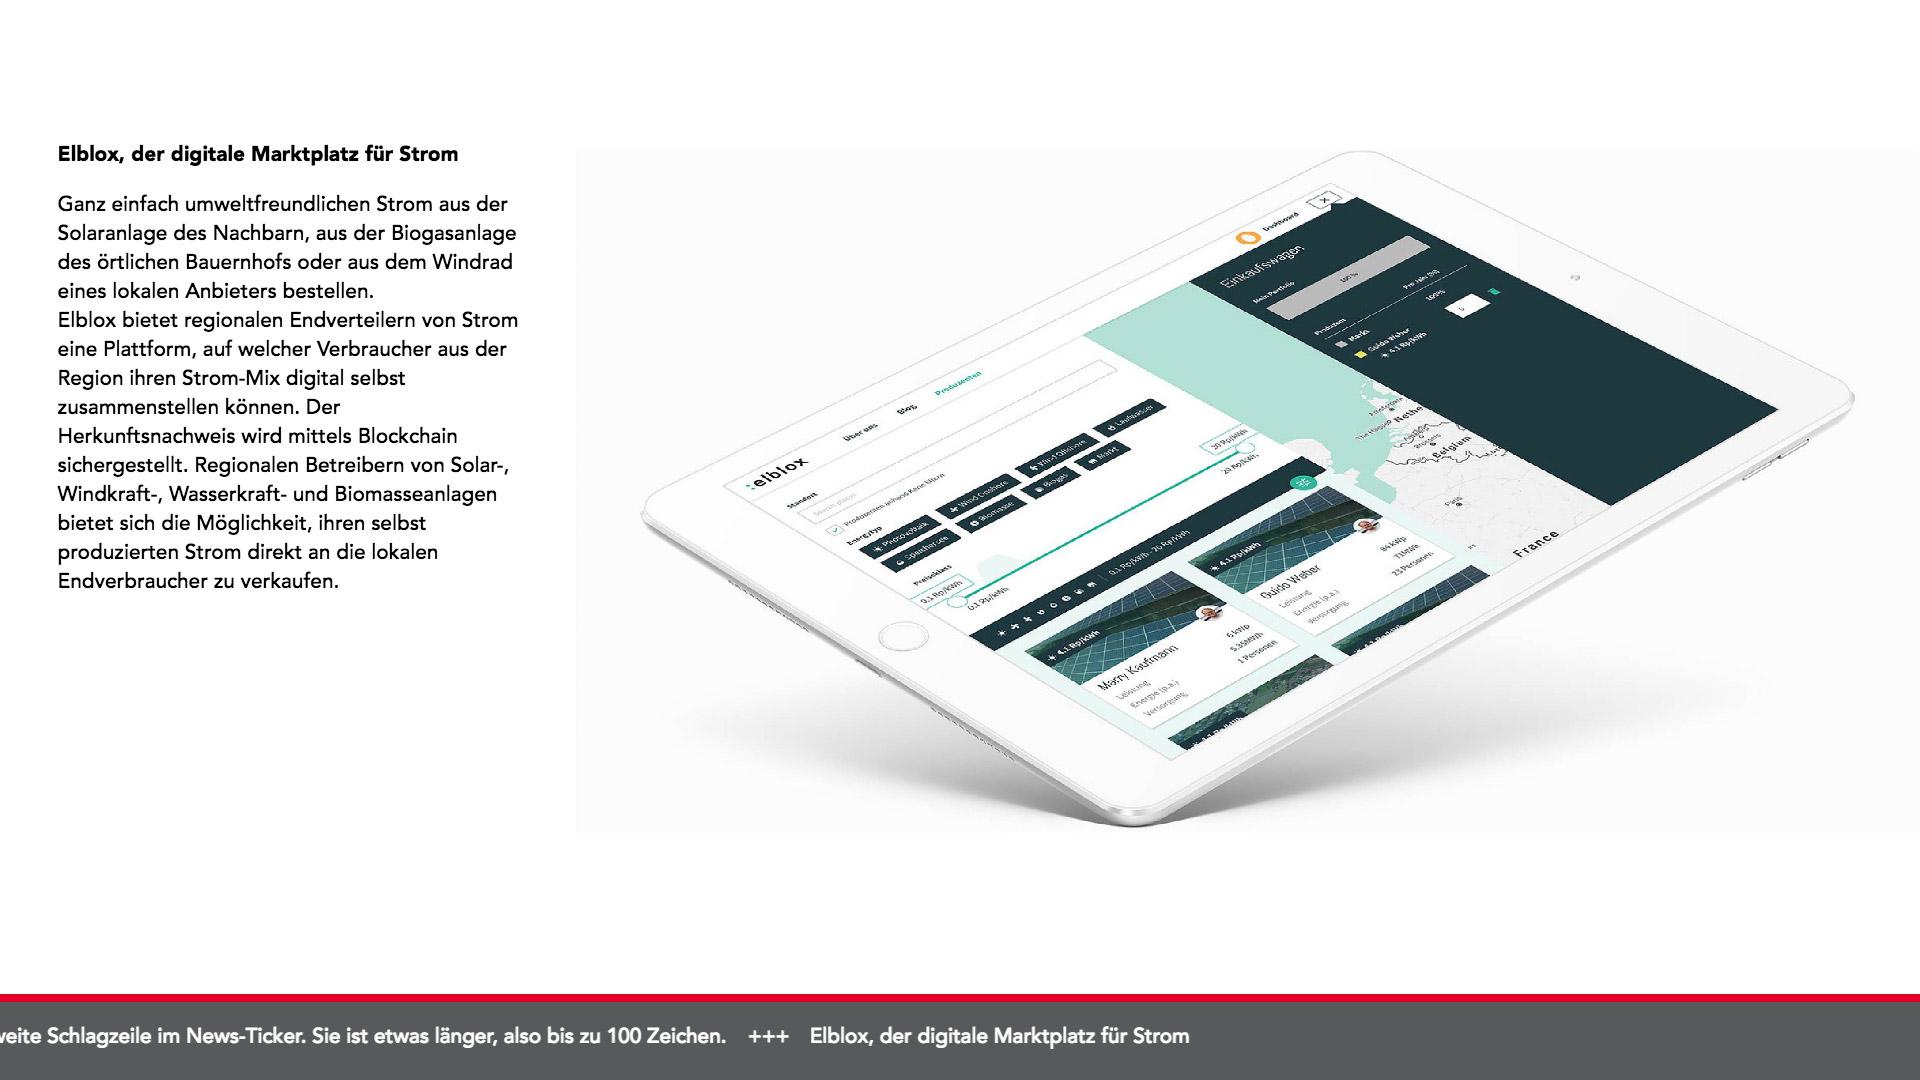 Bild 2 vom Axporama Infoscreen